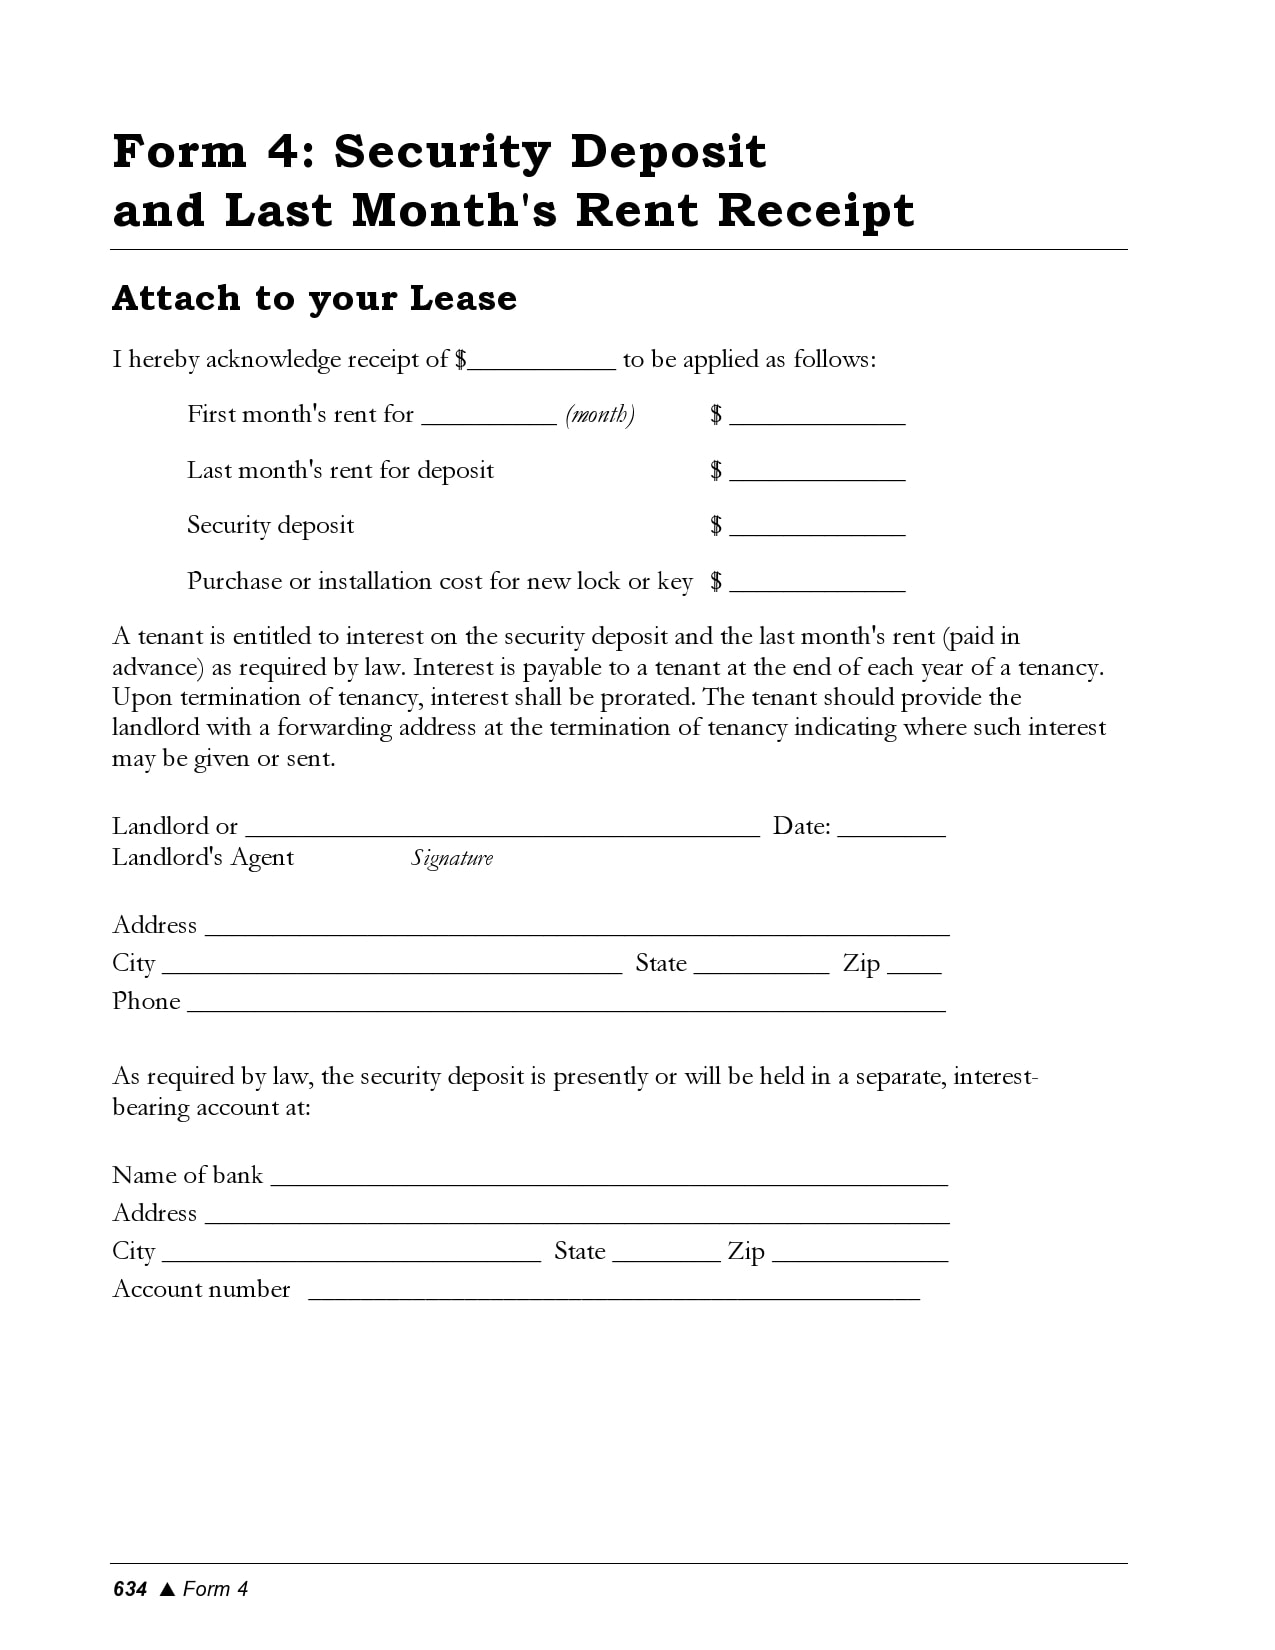 security deposit receipt 29